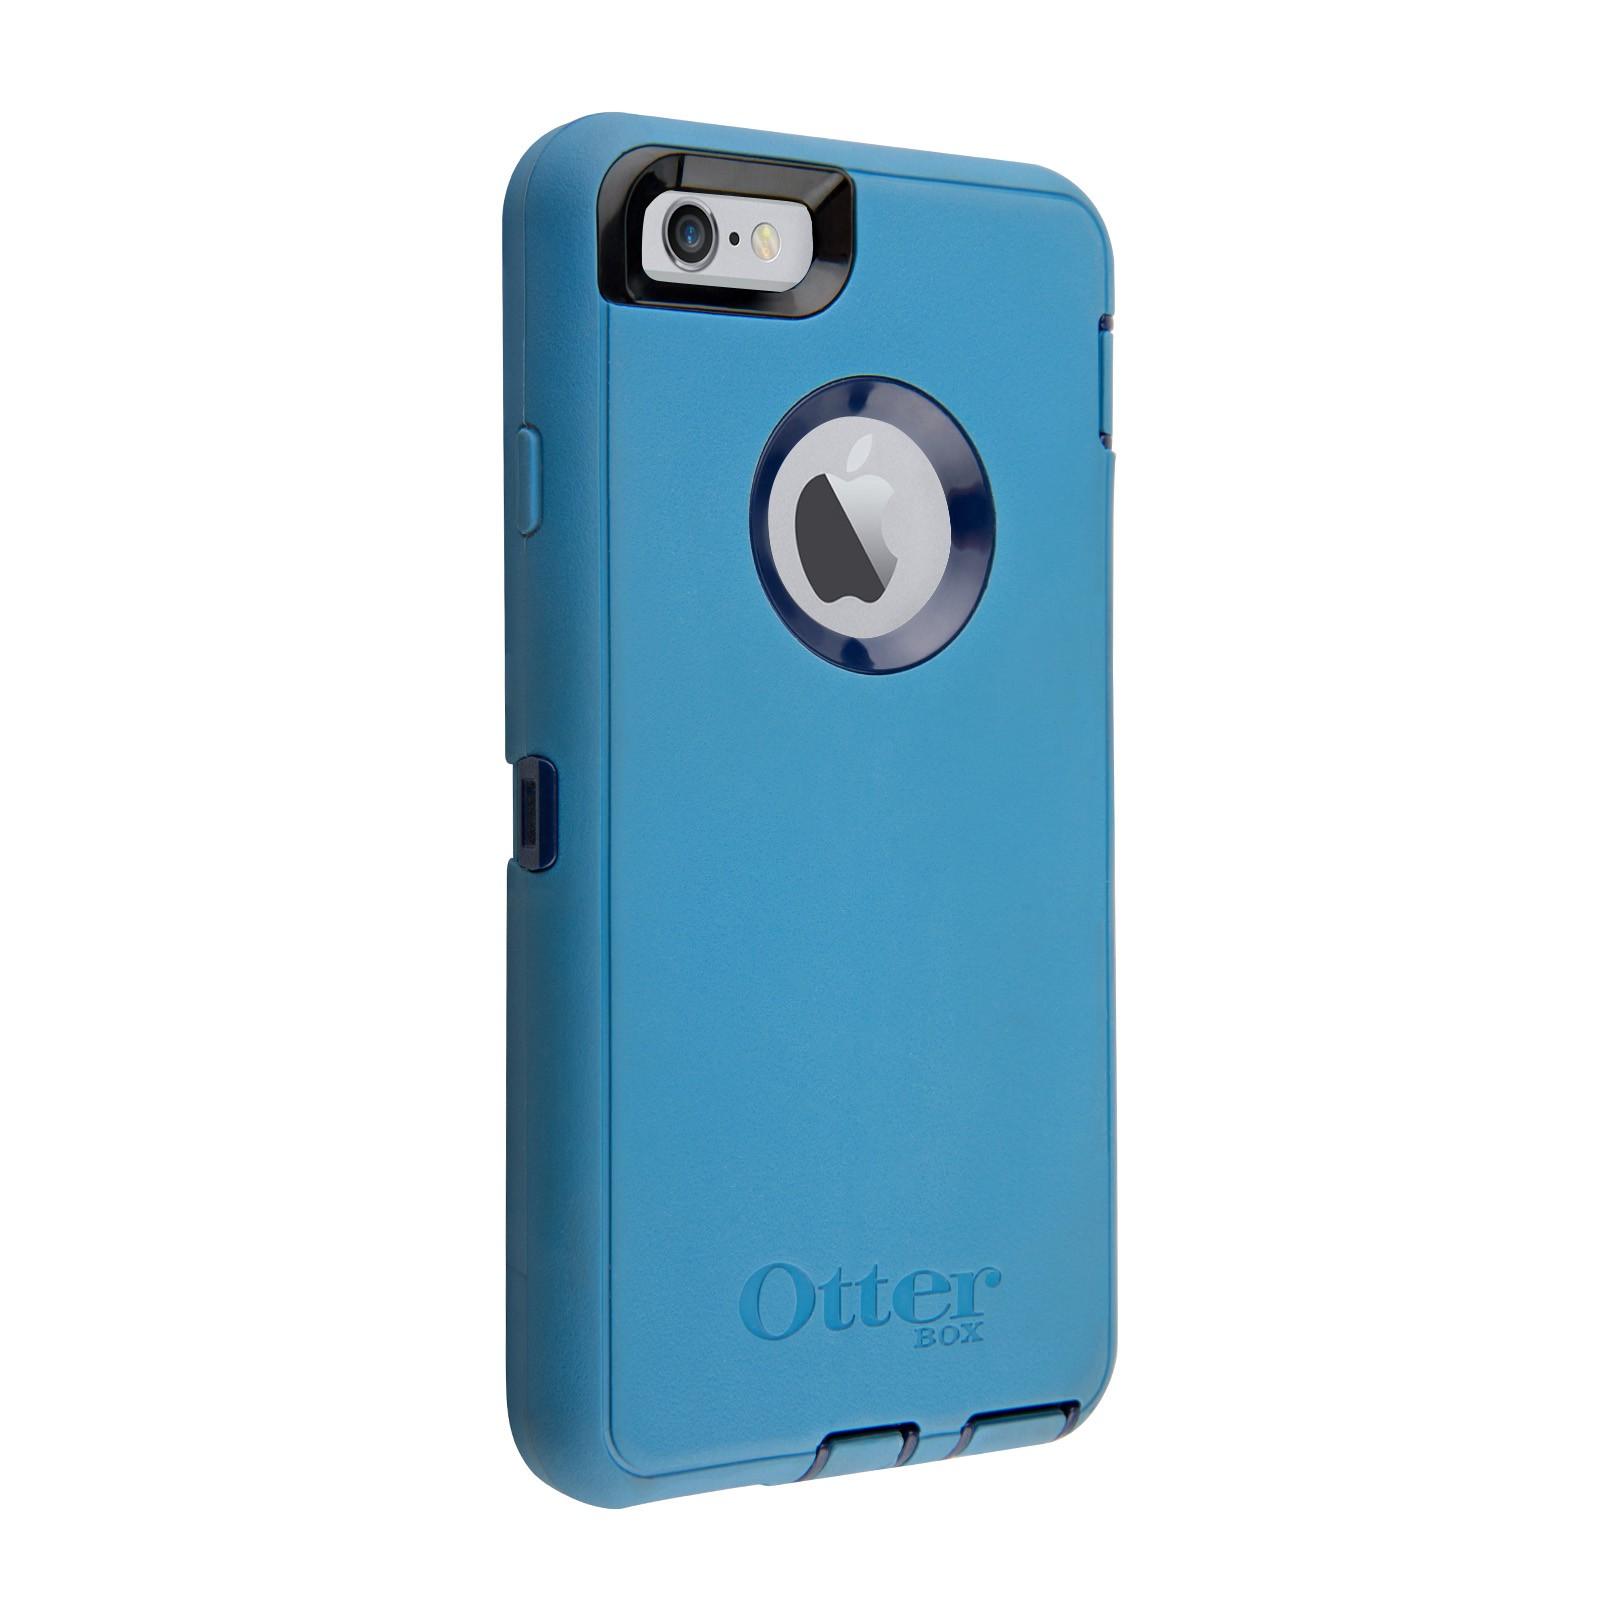 Iphone S Otterbox Case Defender